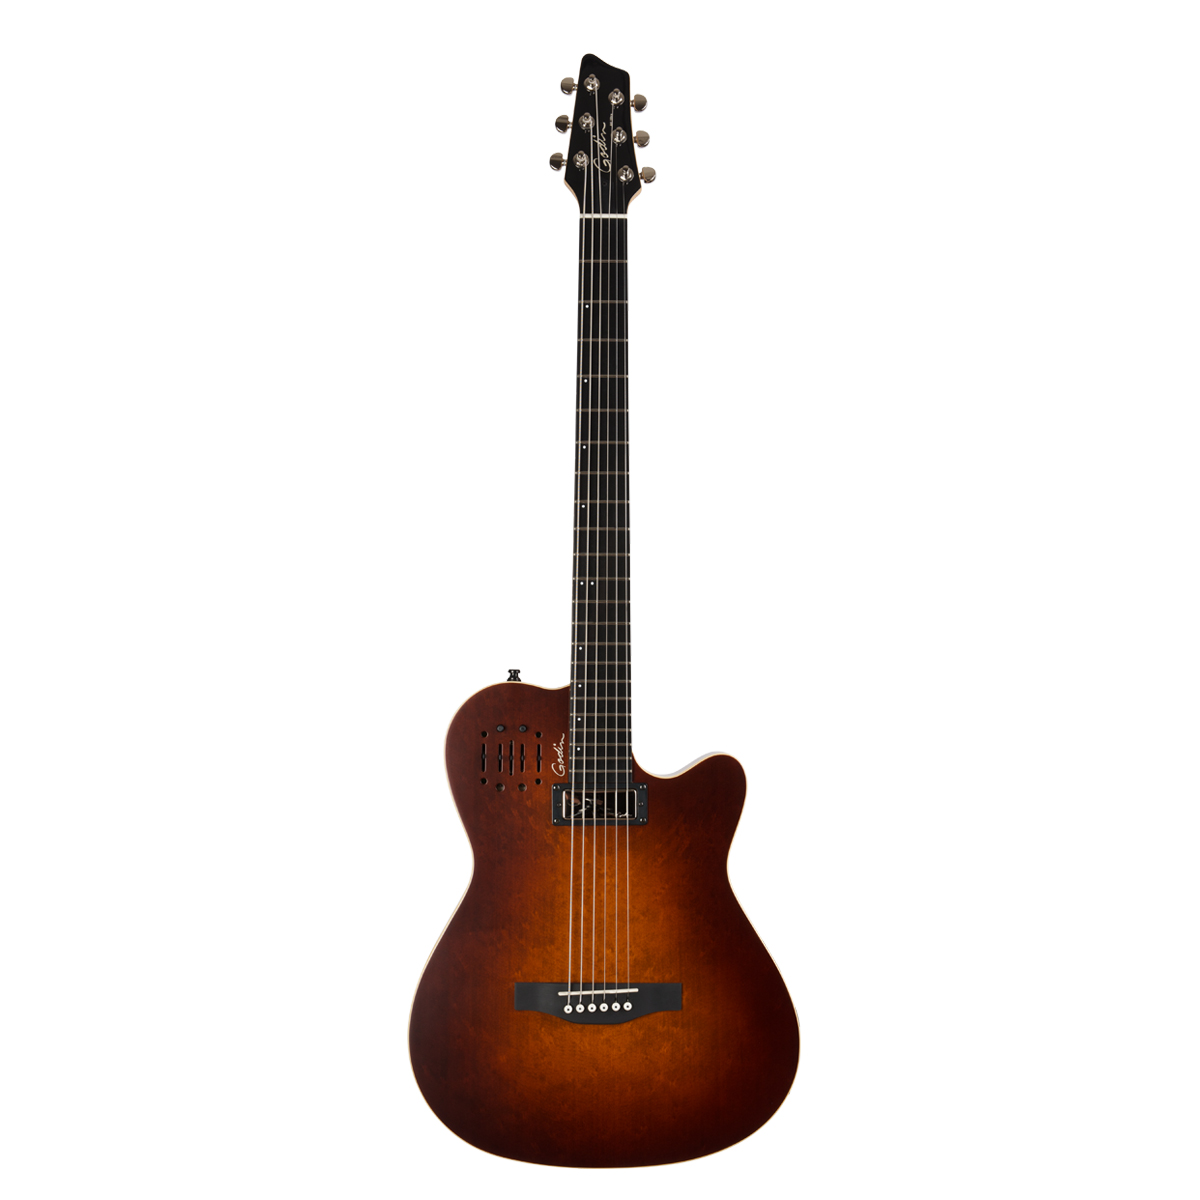 Godin 41602 A6 Ultra Baritone Burst Acoustic Electric Guitar